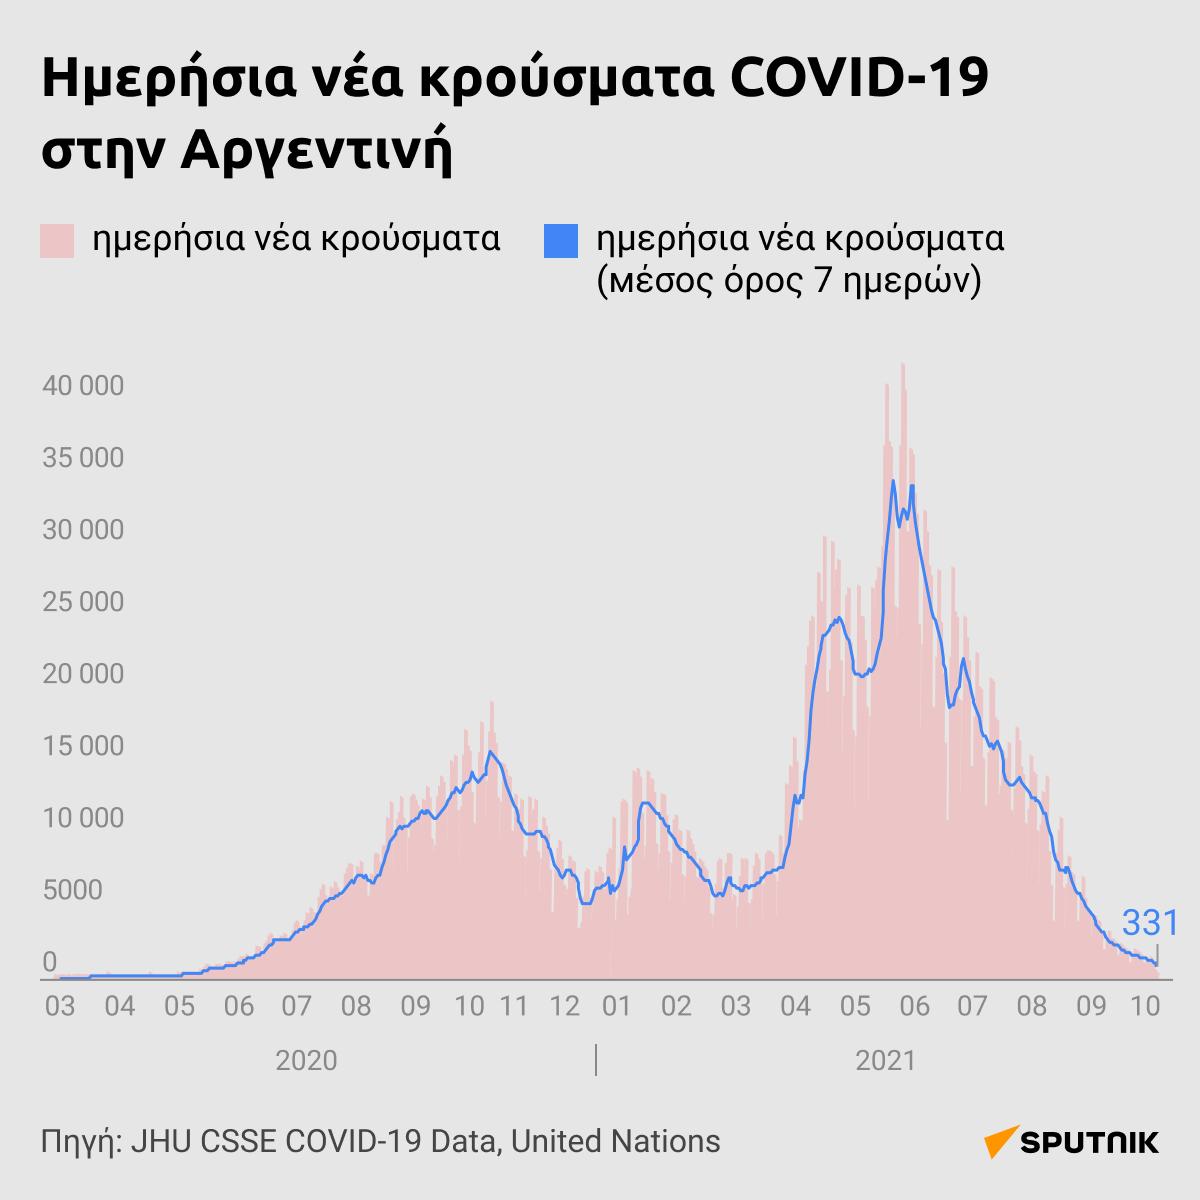 Sputnik Light VS Μετάλλαξη Δέλτα: Τι δείχνουν τα δεδομένα για το ρωσικό μονοδοσικό εμβόλιο - Sputnik Ελλάδα